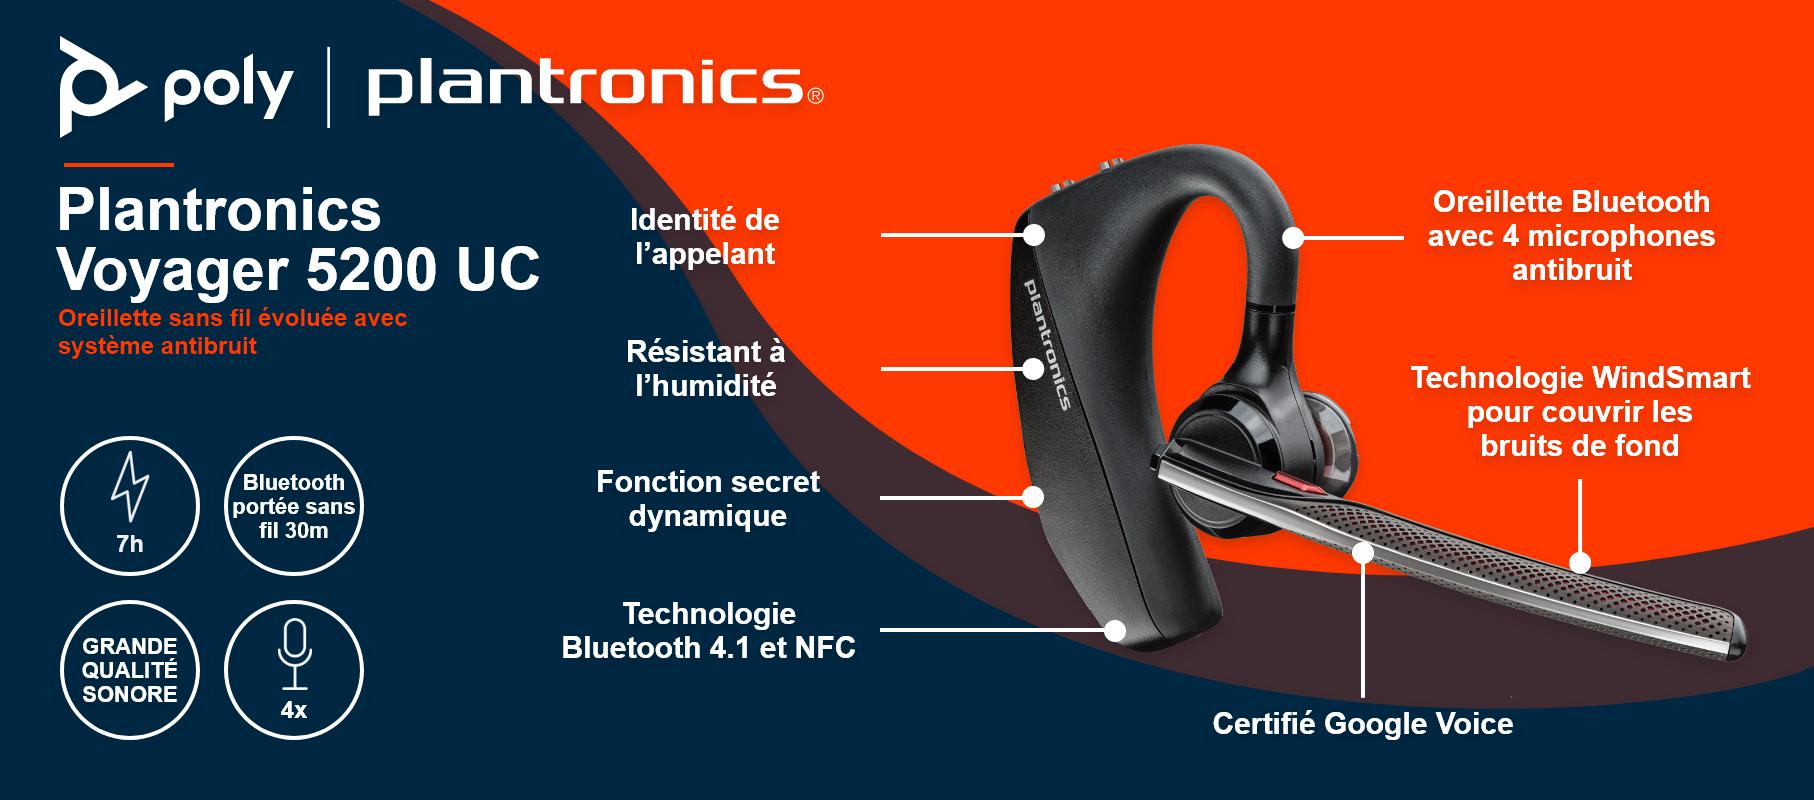 Oreillette Bluetooth Plantronics Voyager 5200 UC